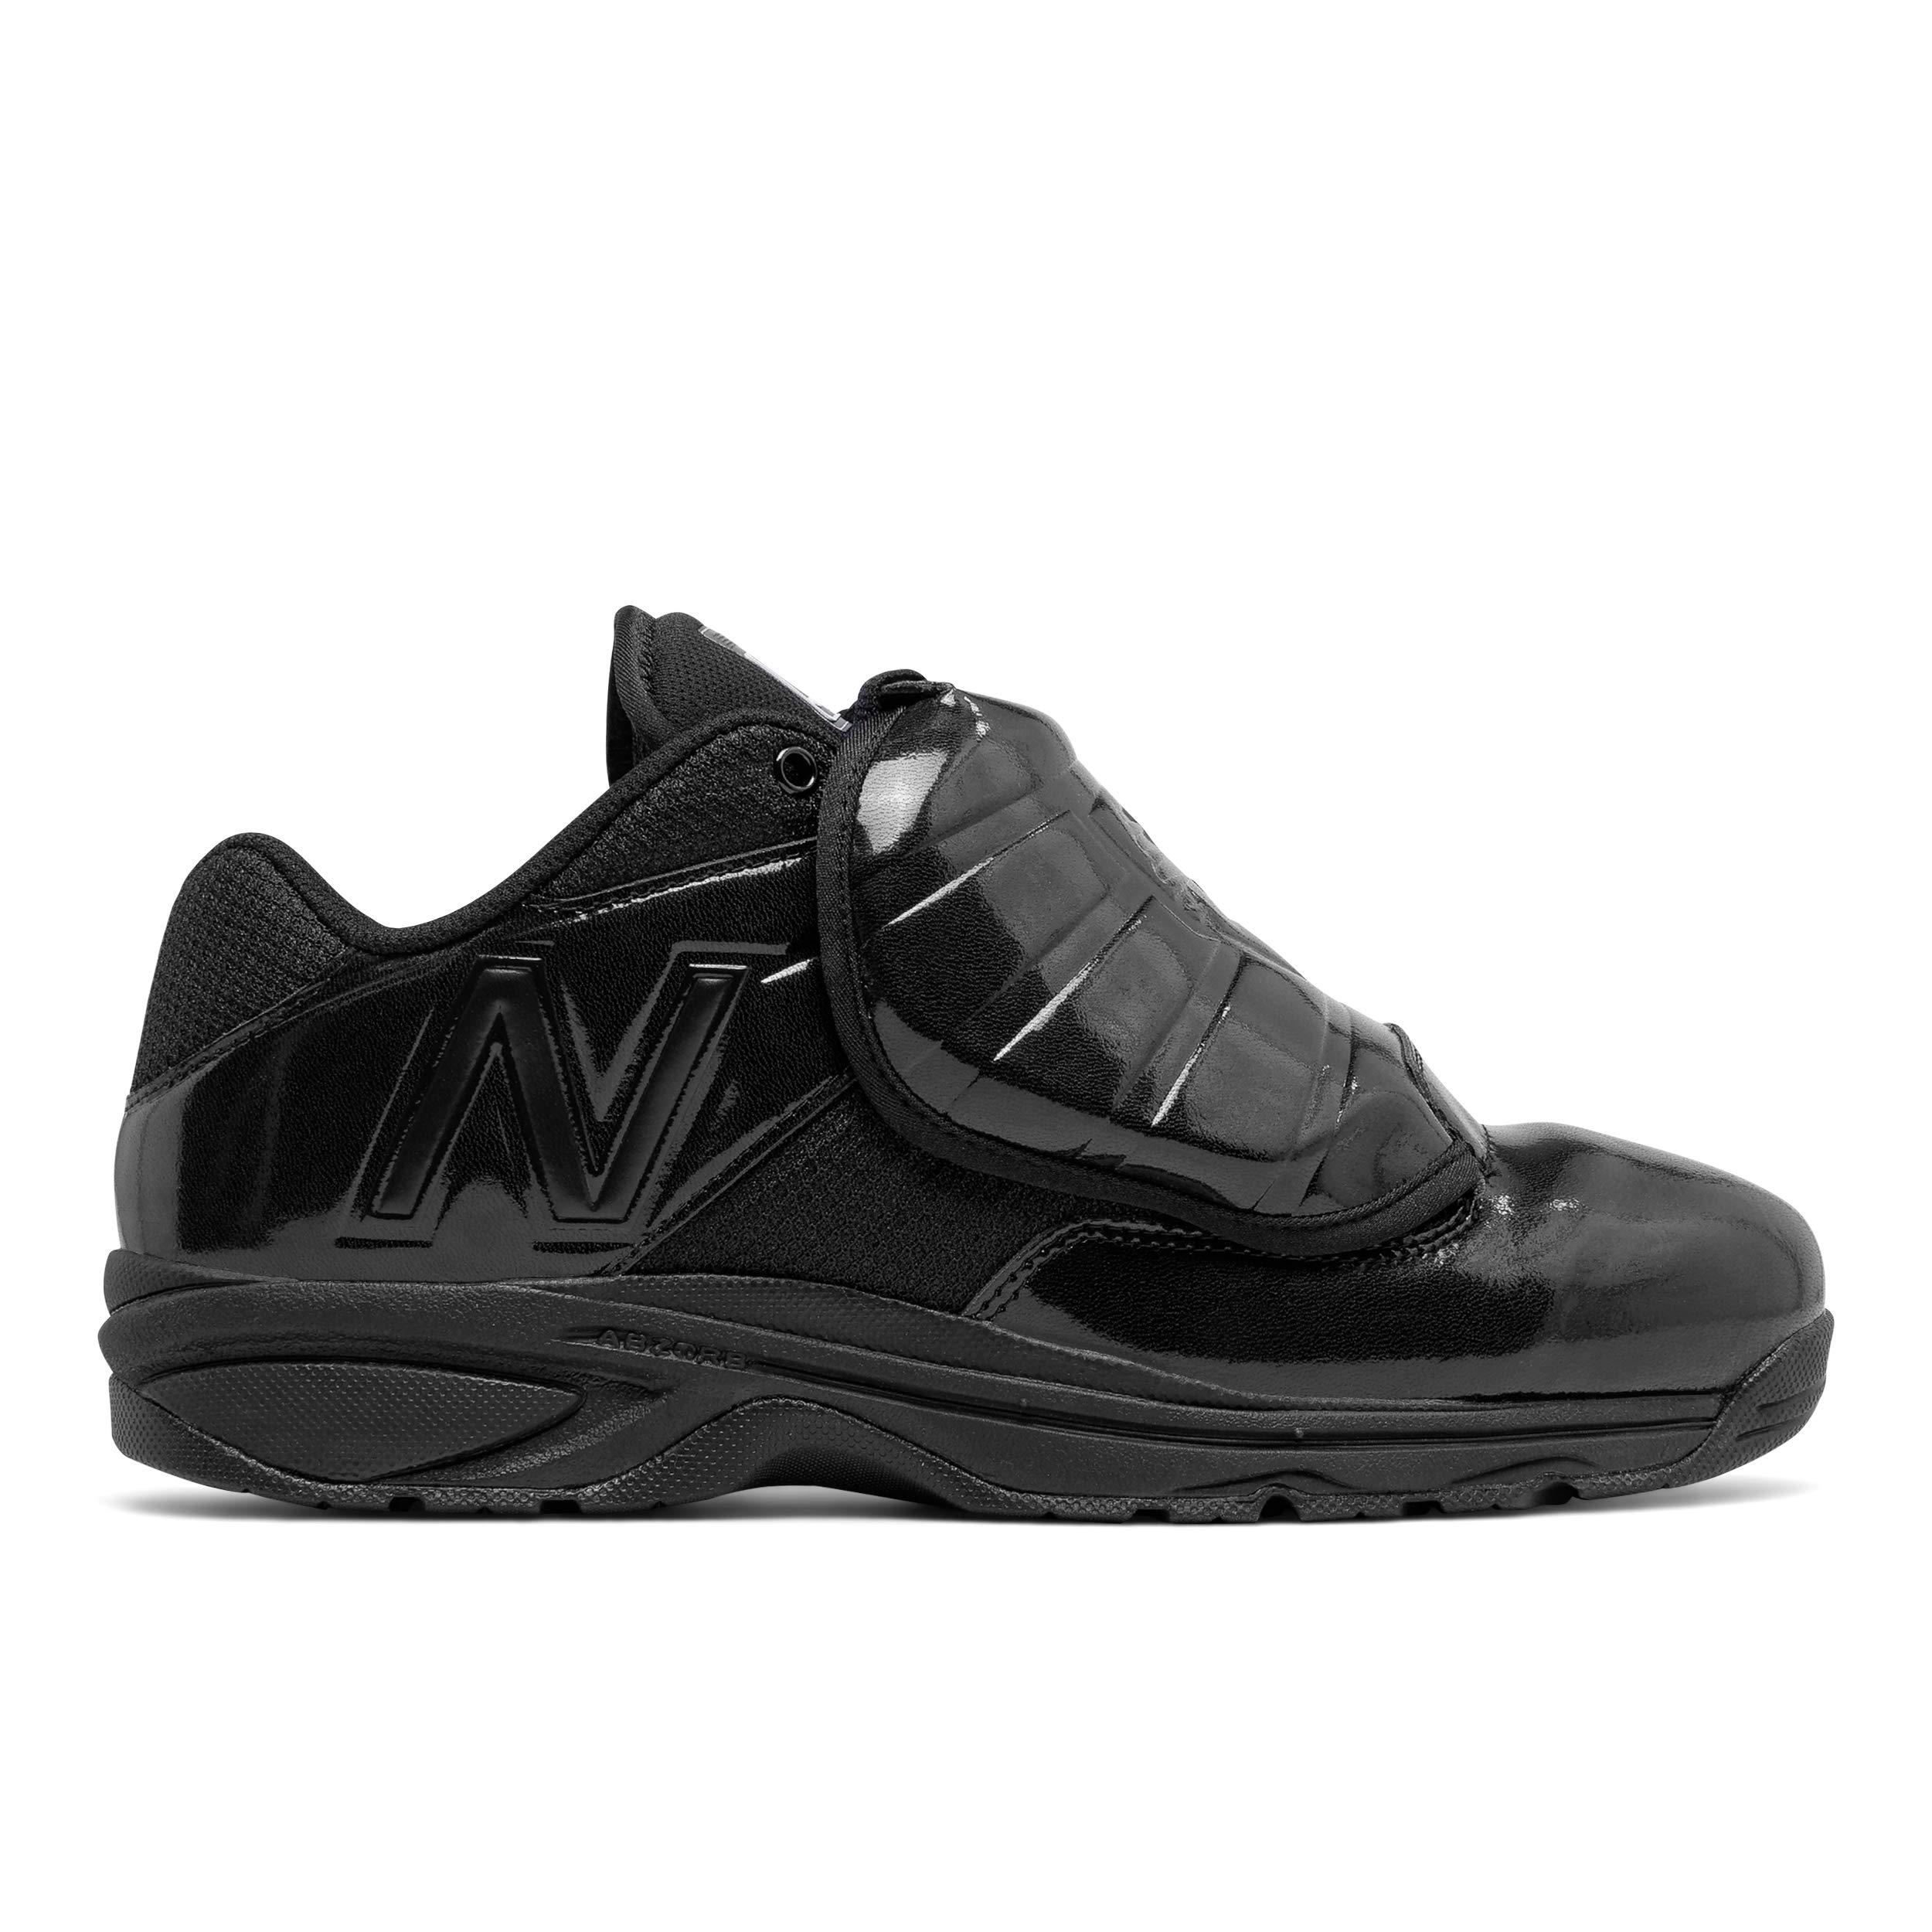 New Balance Men's MUL460K3 Umpire Baseball Shoe, Black/Black, 9.5 D US by New Balance